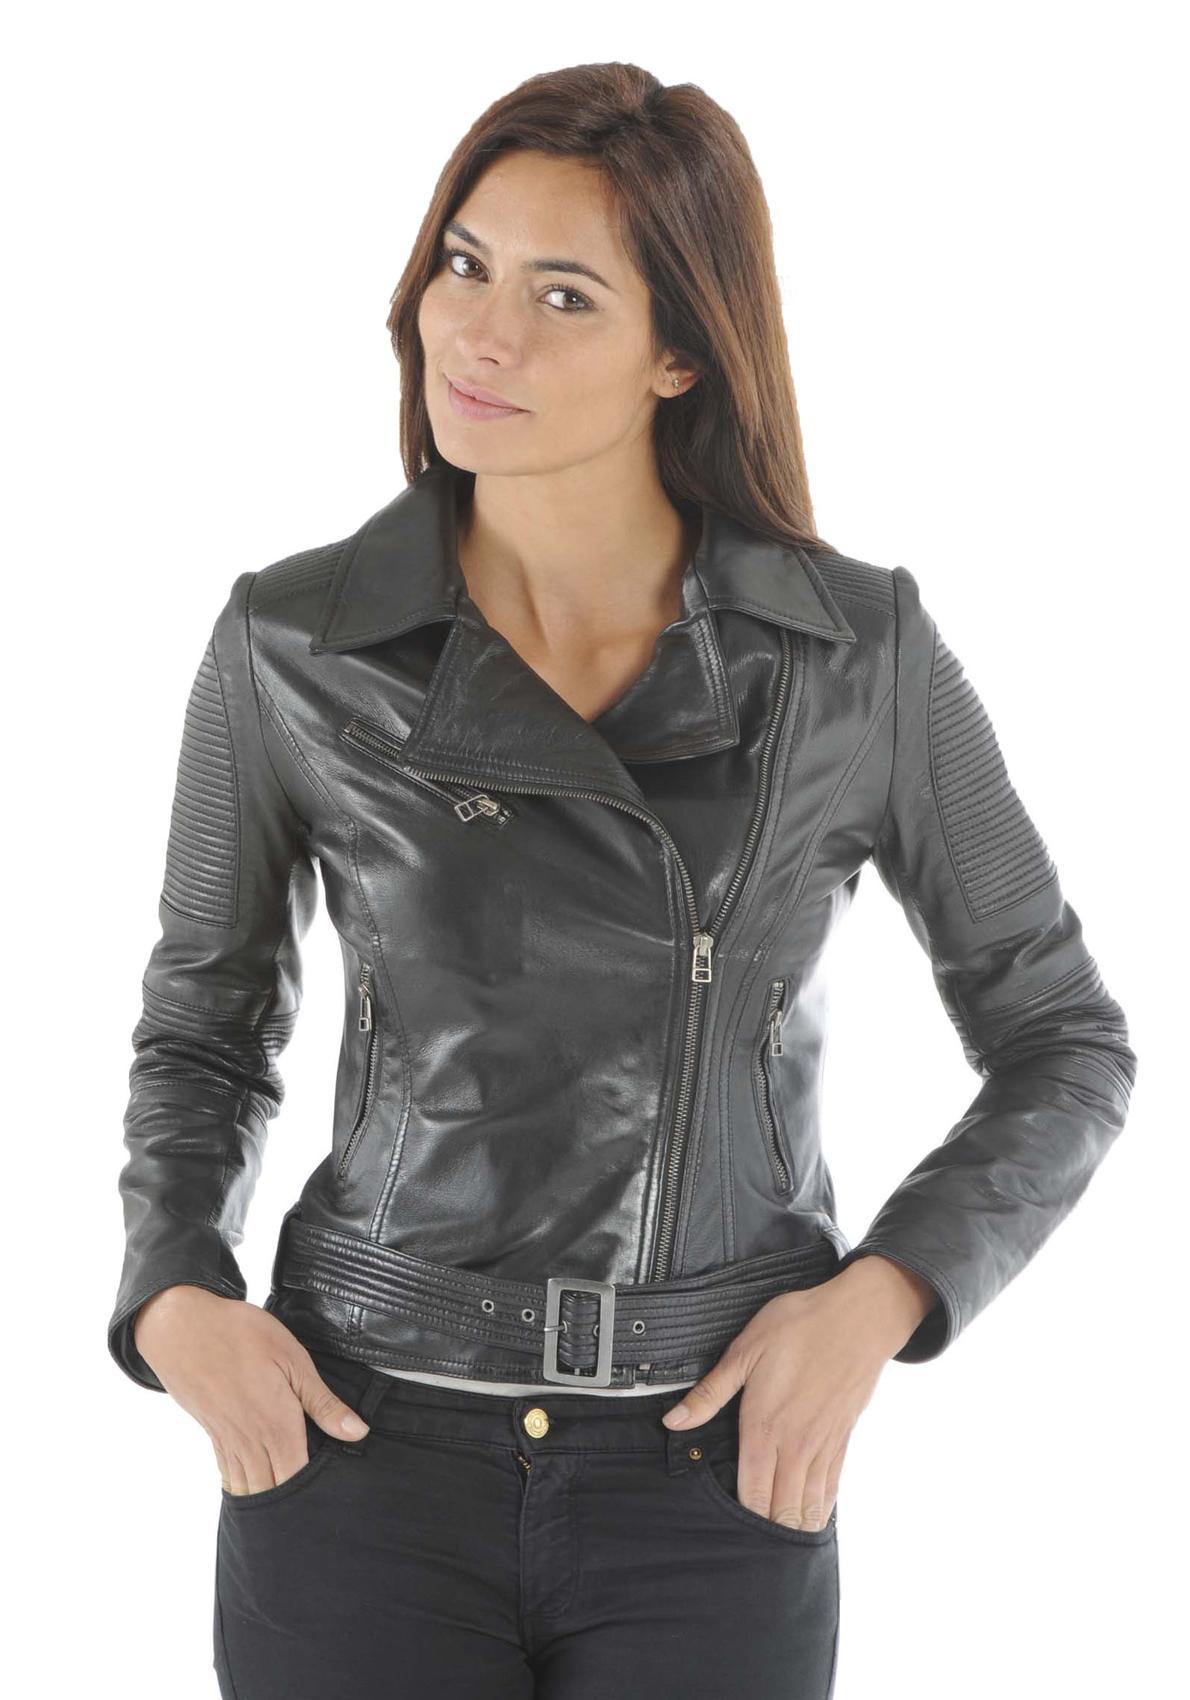 Veste en cuir femme prix usine